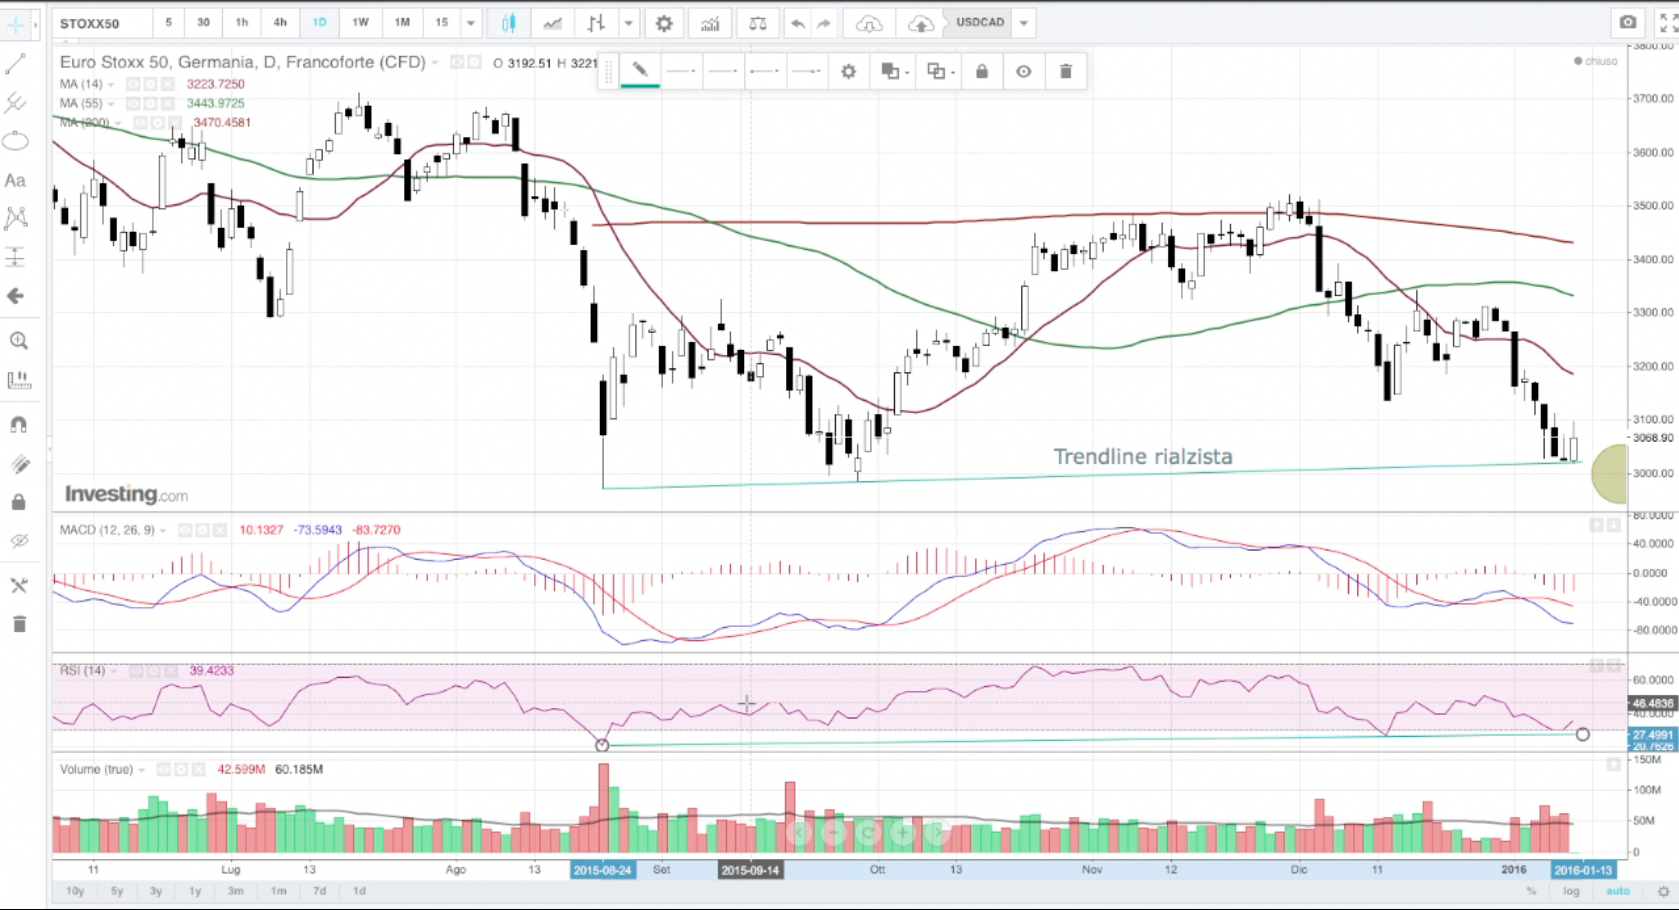 Video strategia n.5 – trading online su EUROSTOX50